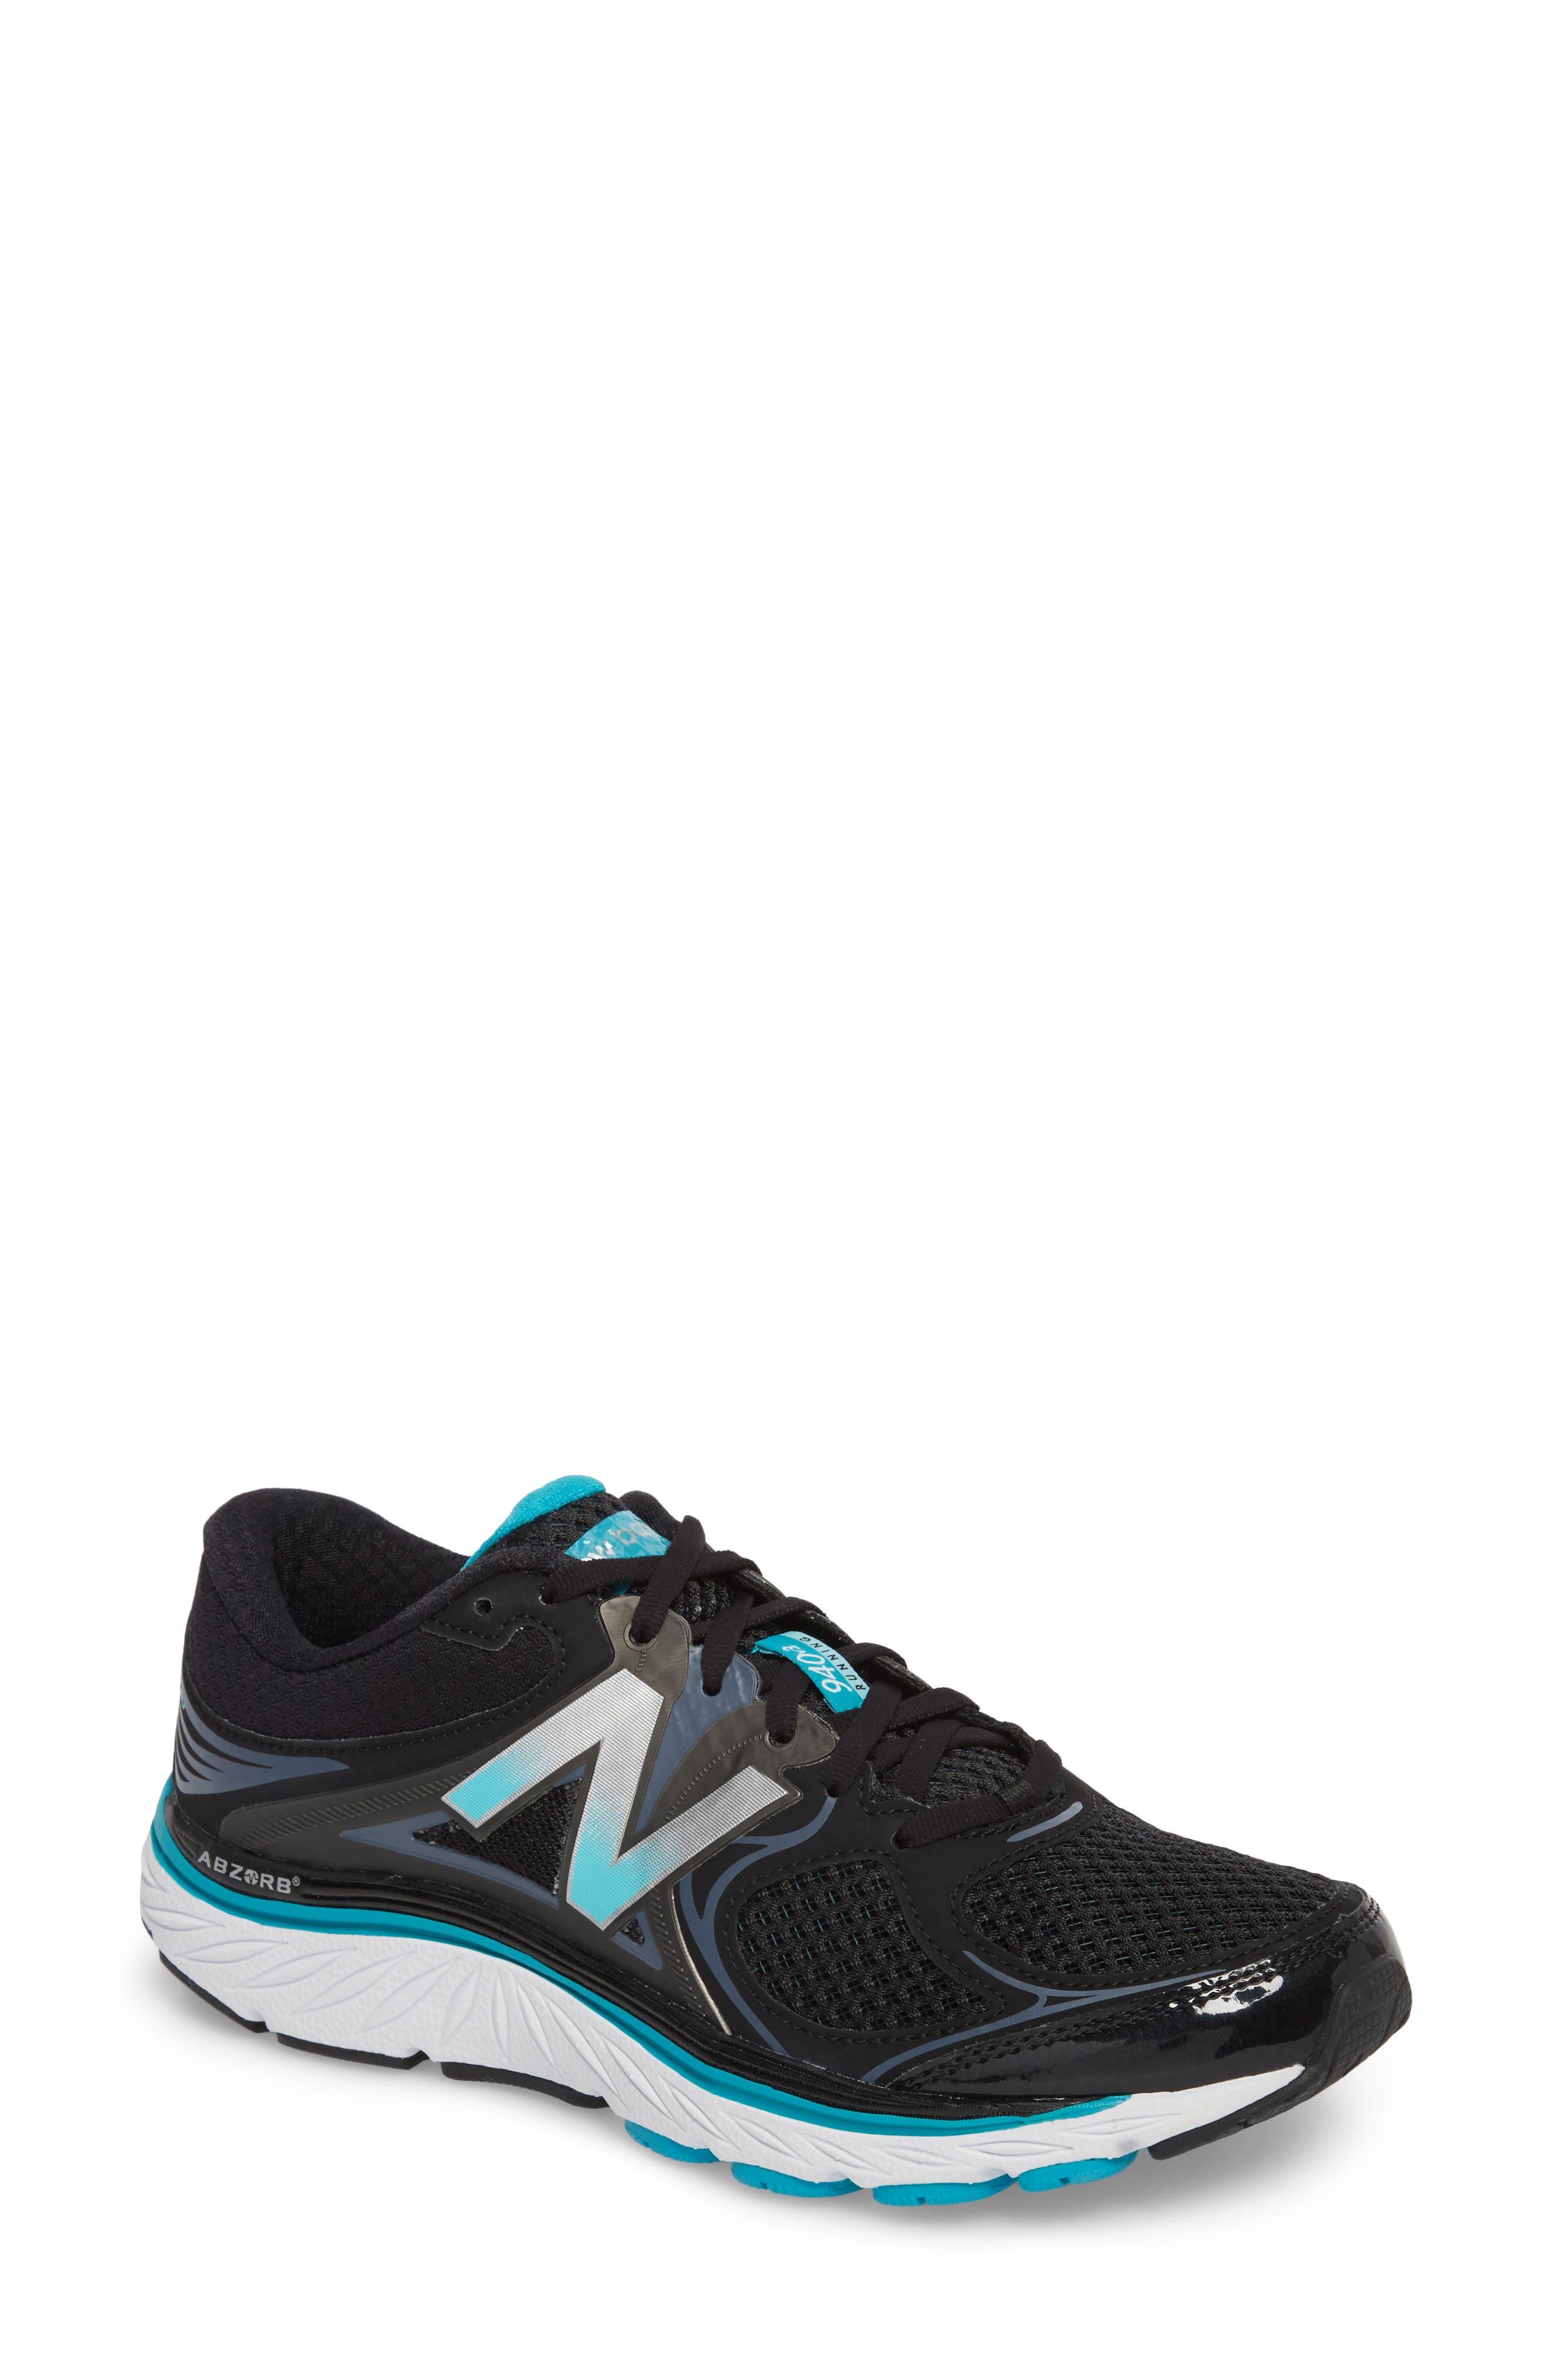 New Balance 940v3 Running Shoe (Women)